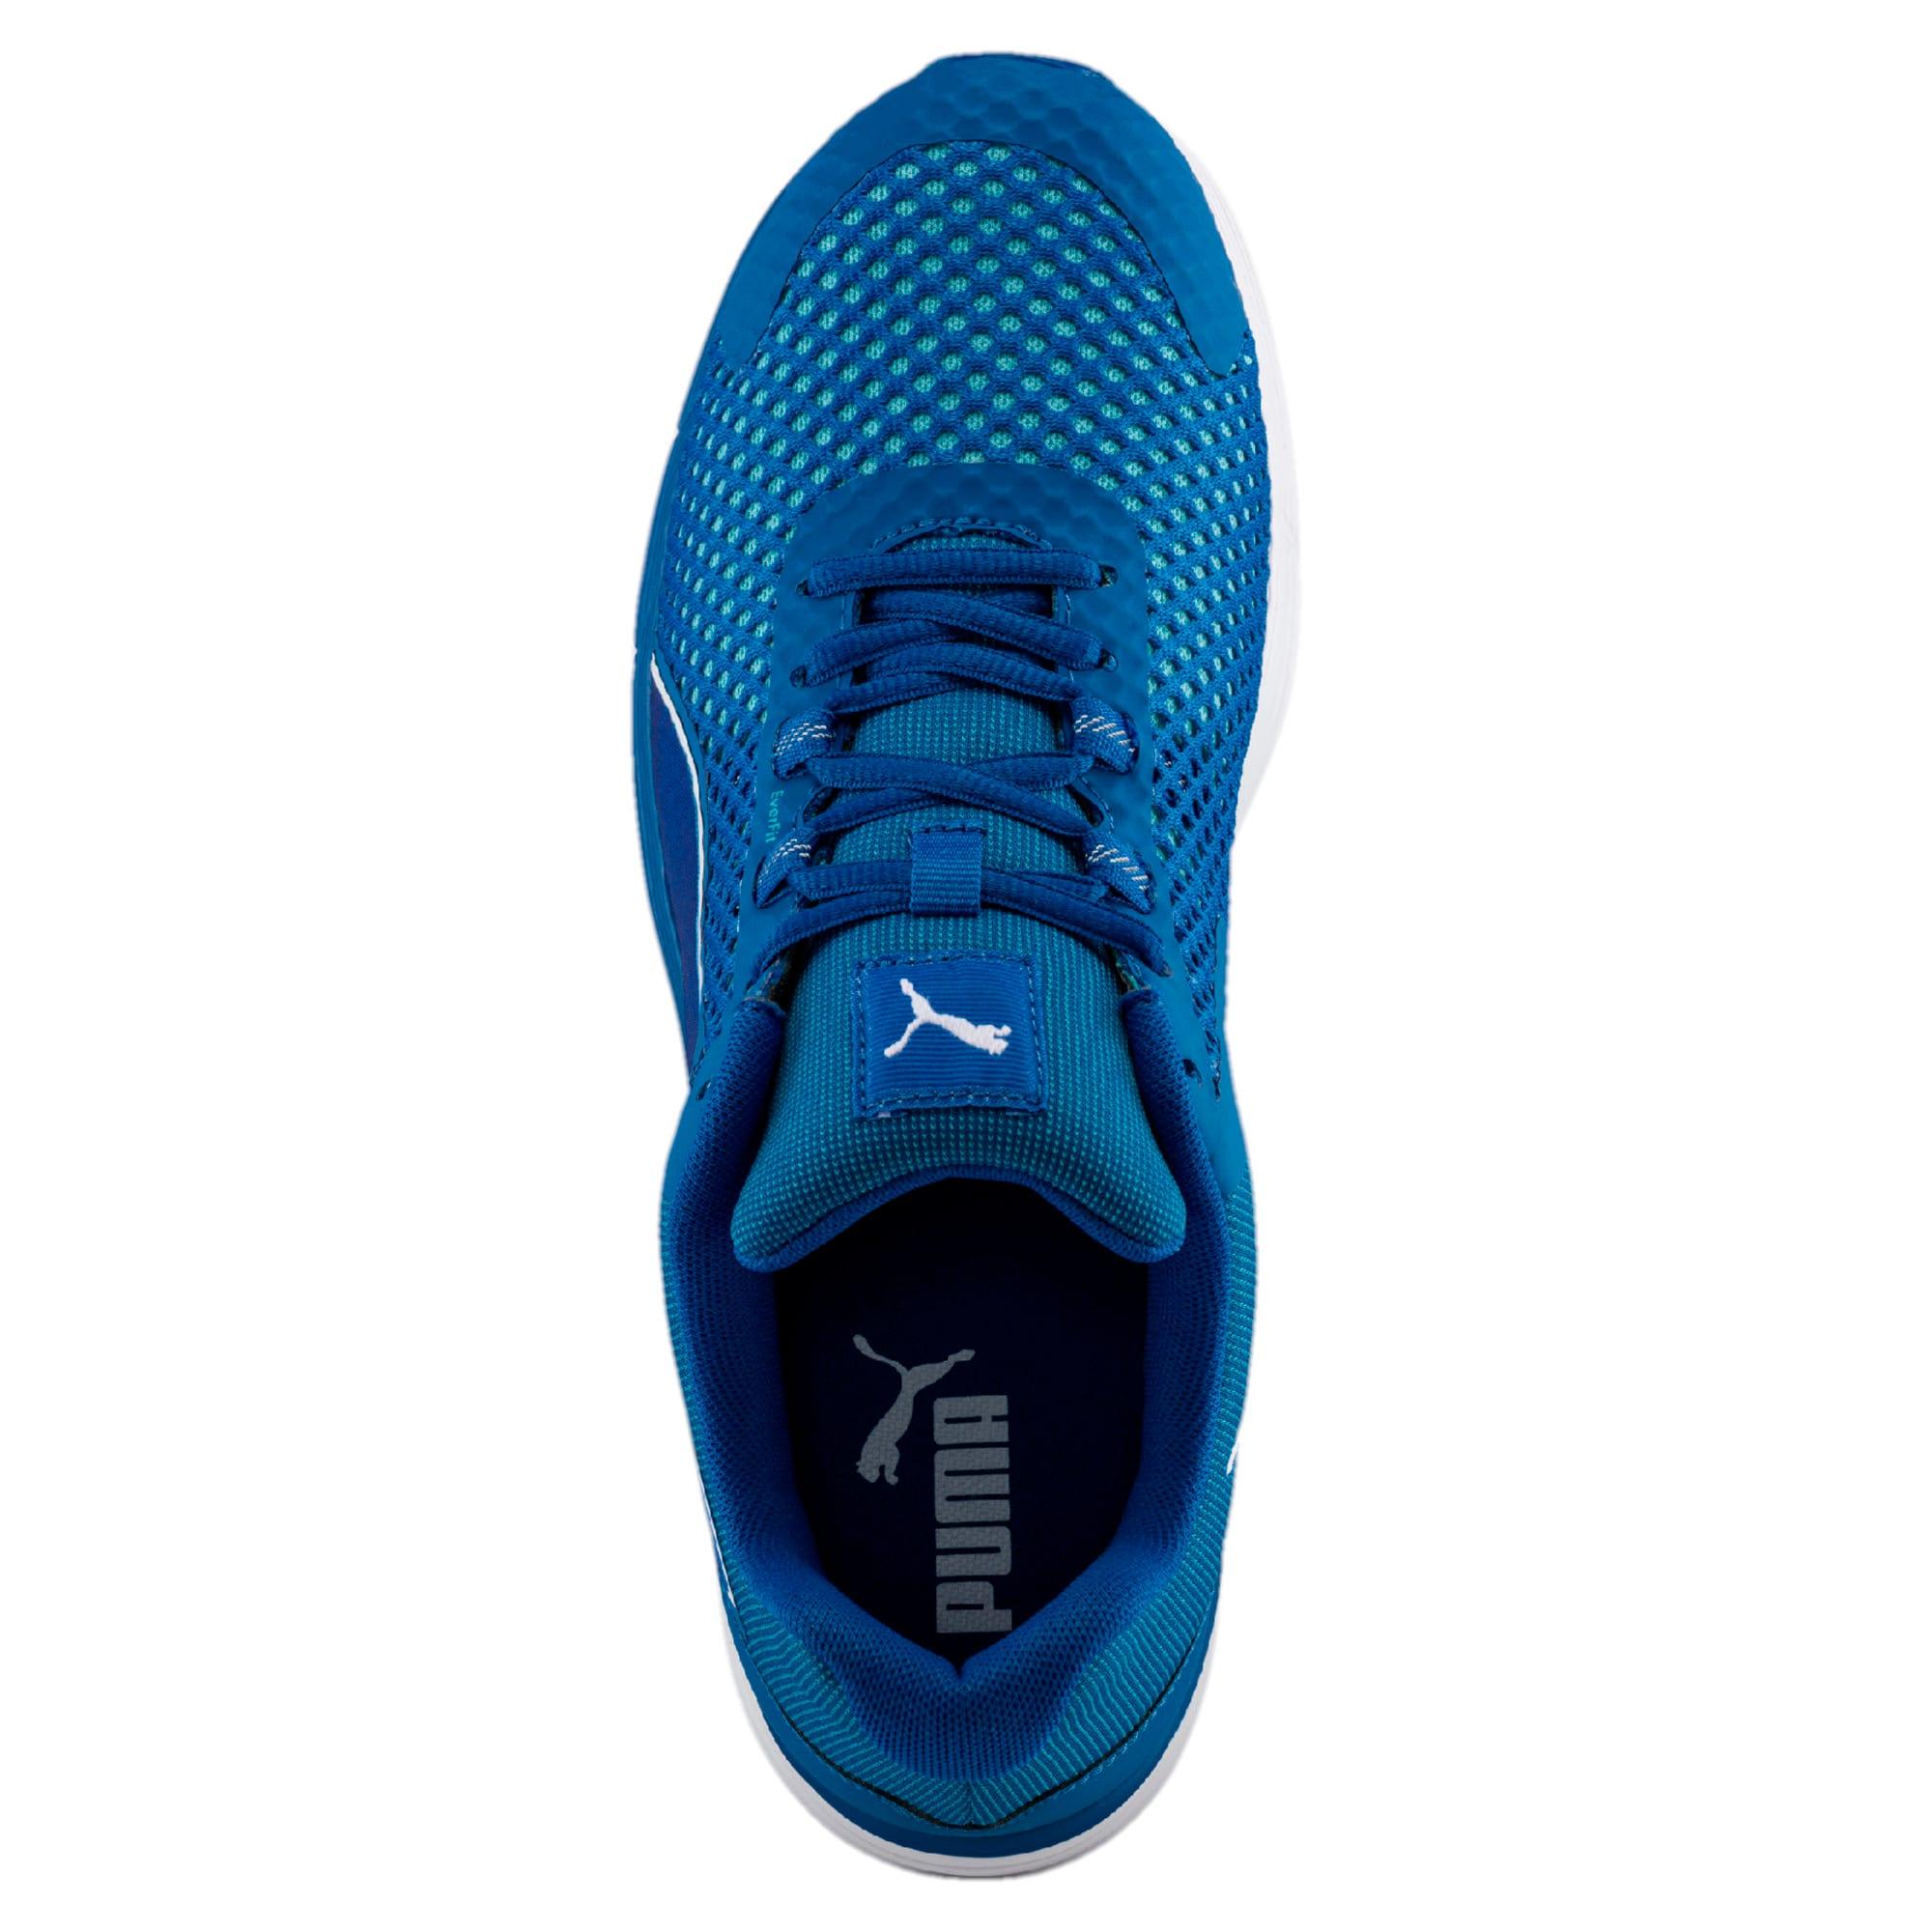 Thumbnail 4 of Propel 2 Men's Running Shoes, Lapis Blue-Turquoise-White, medium-IND